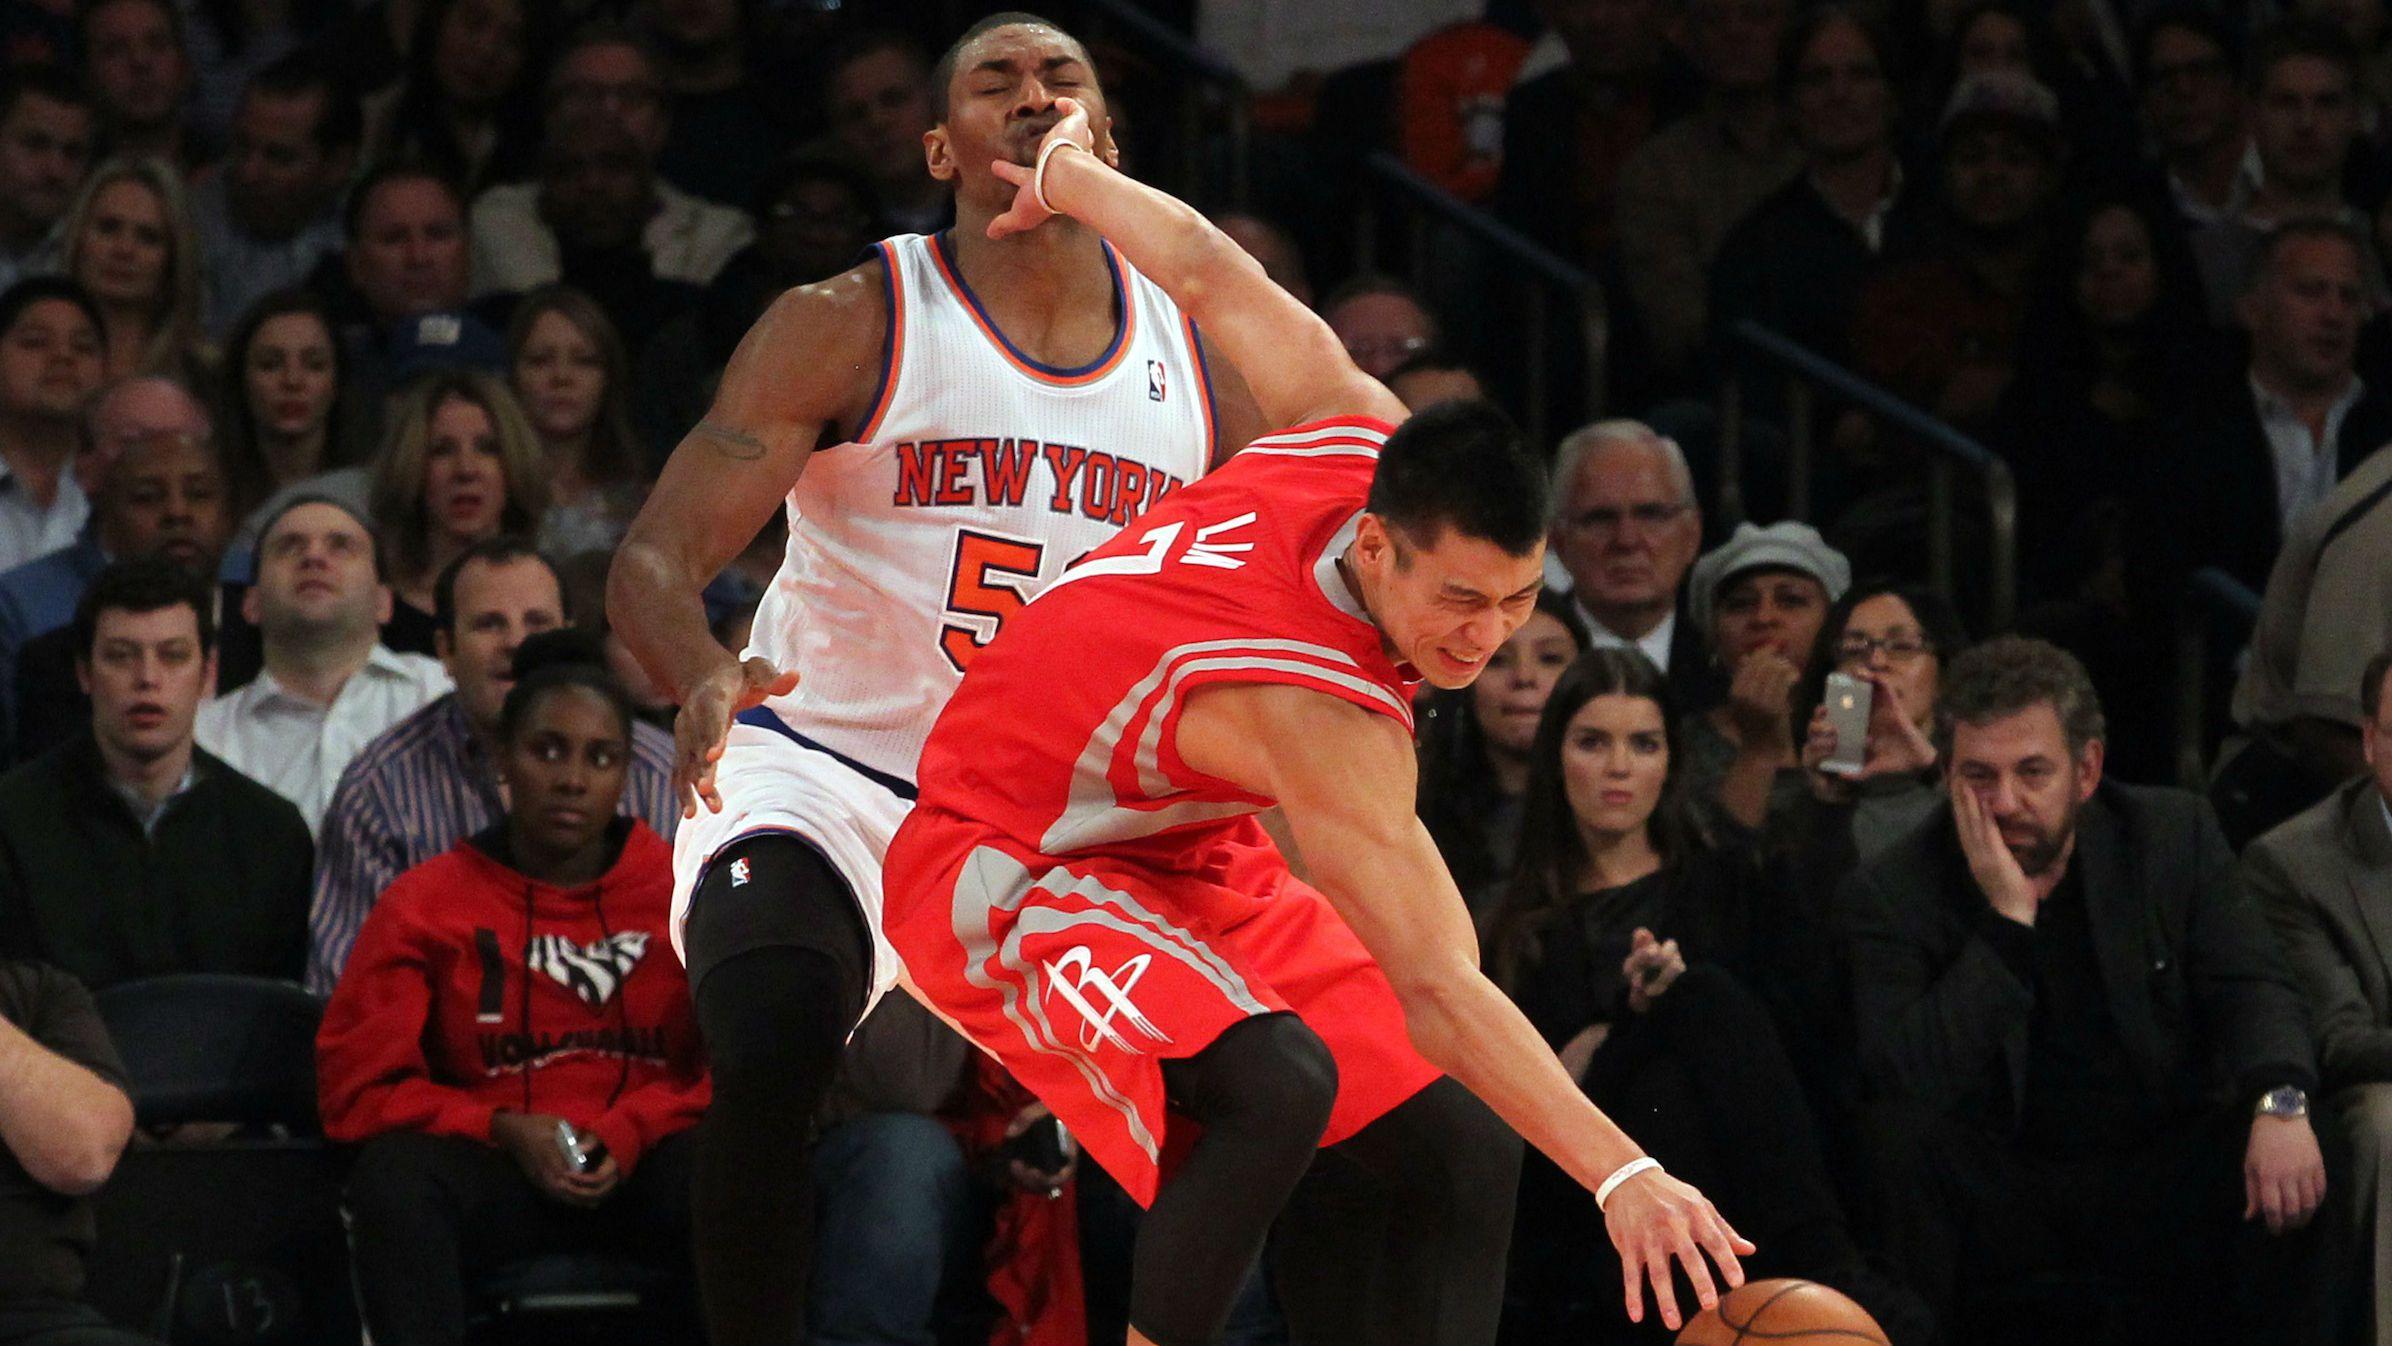 Houston Rockets point guard Jeremy Lin (7) is fouled by New York Knicks small forward Metta World Peace